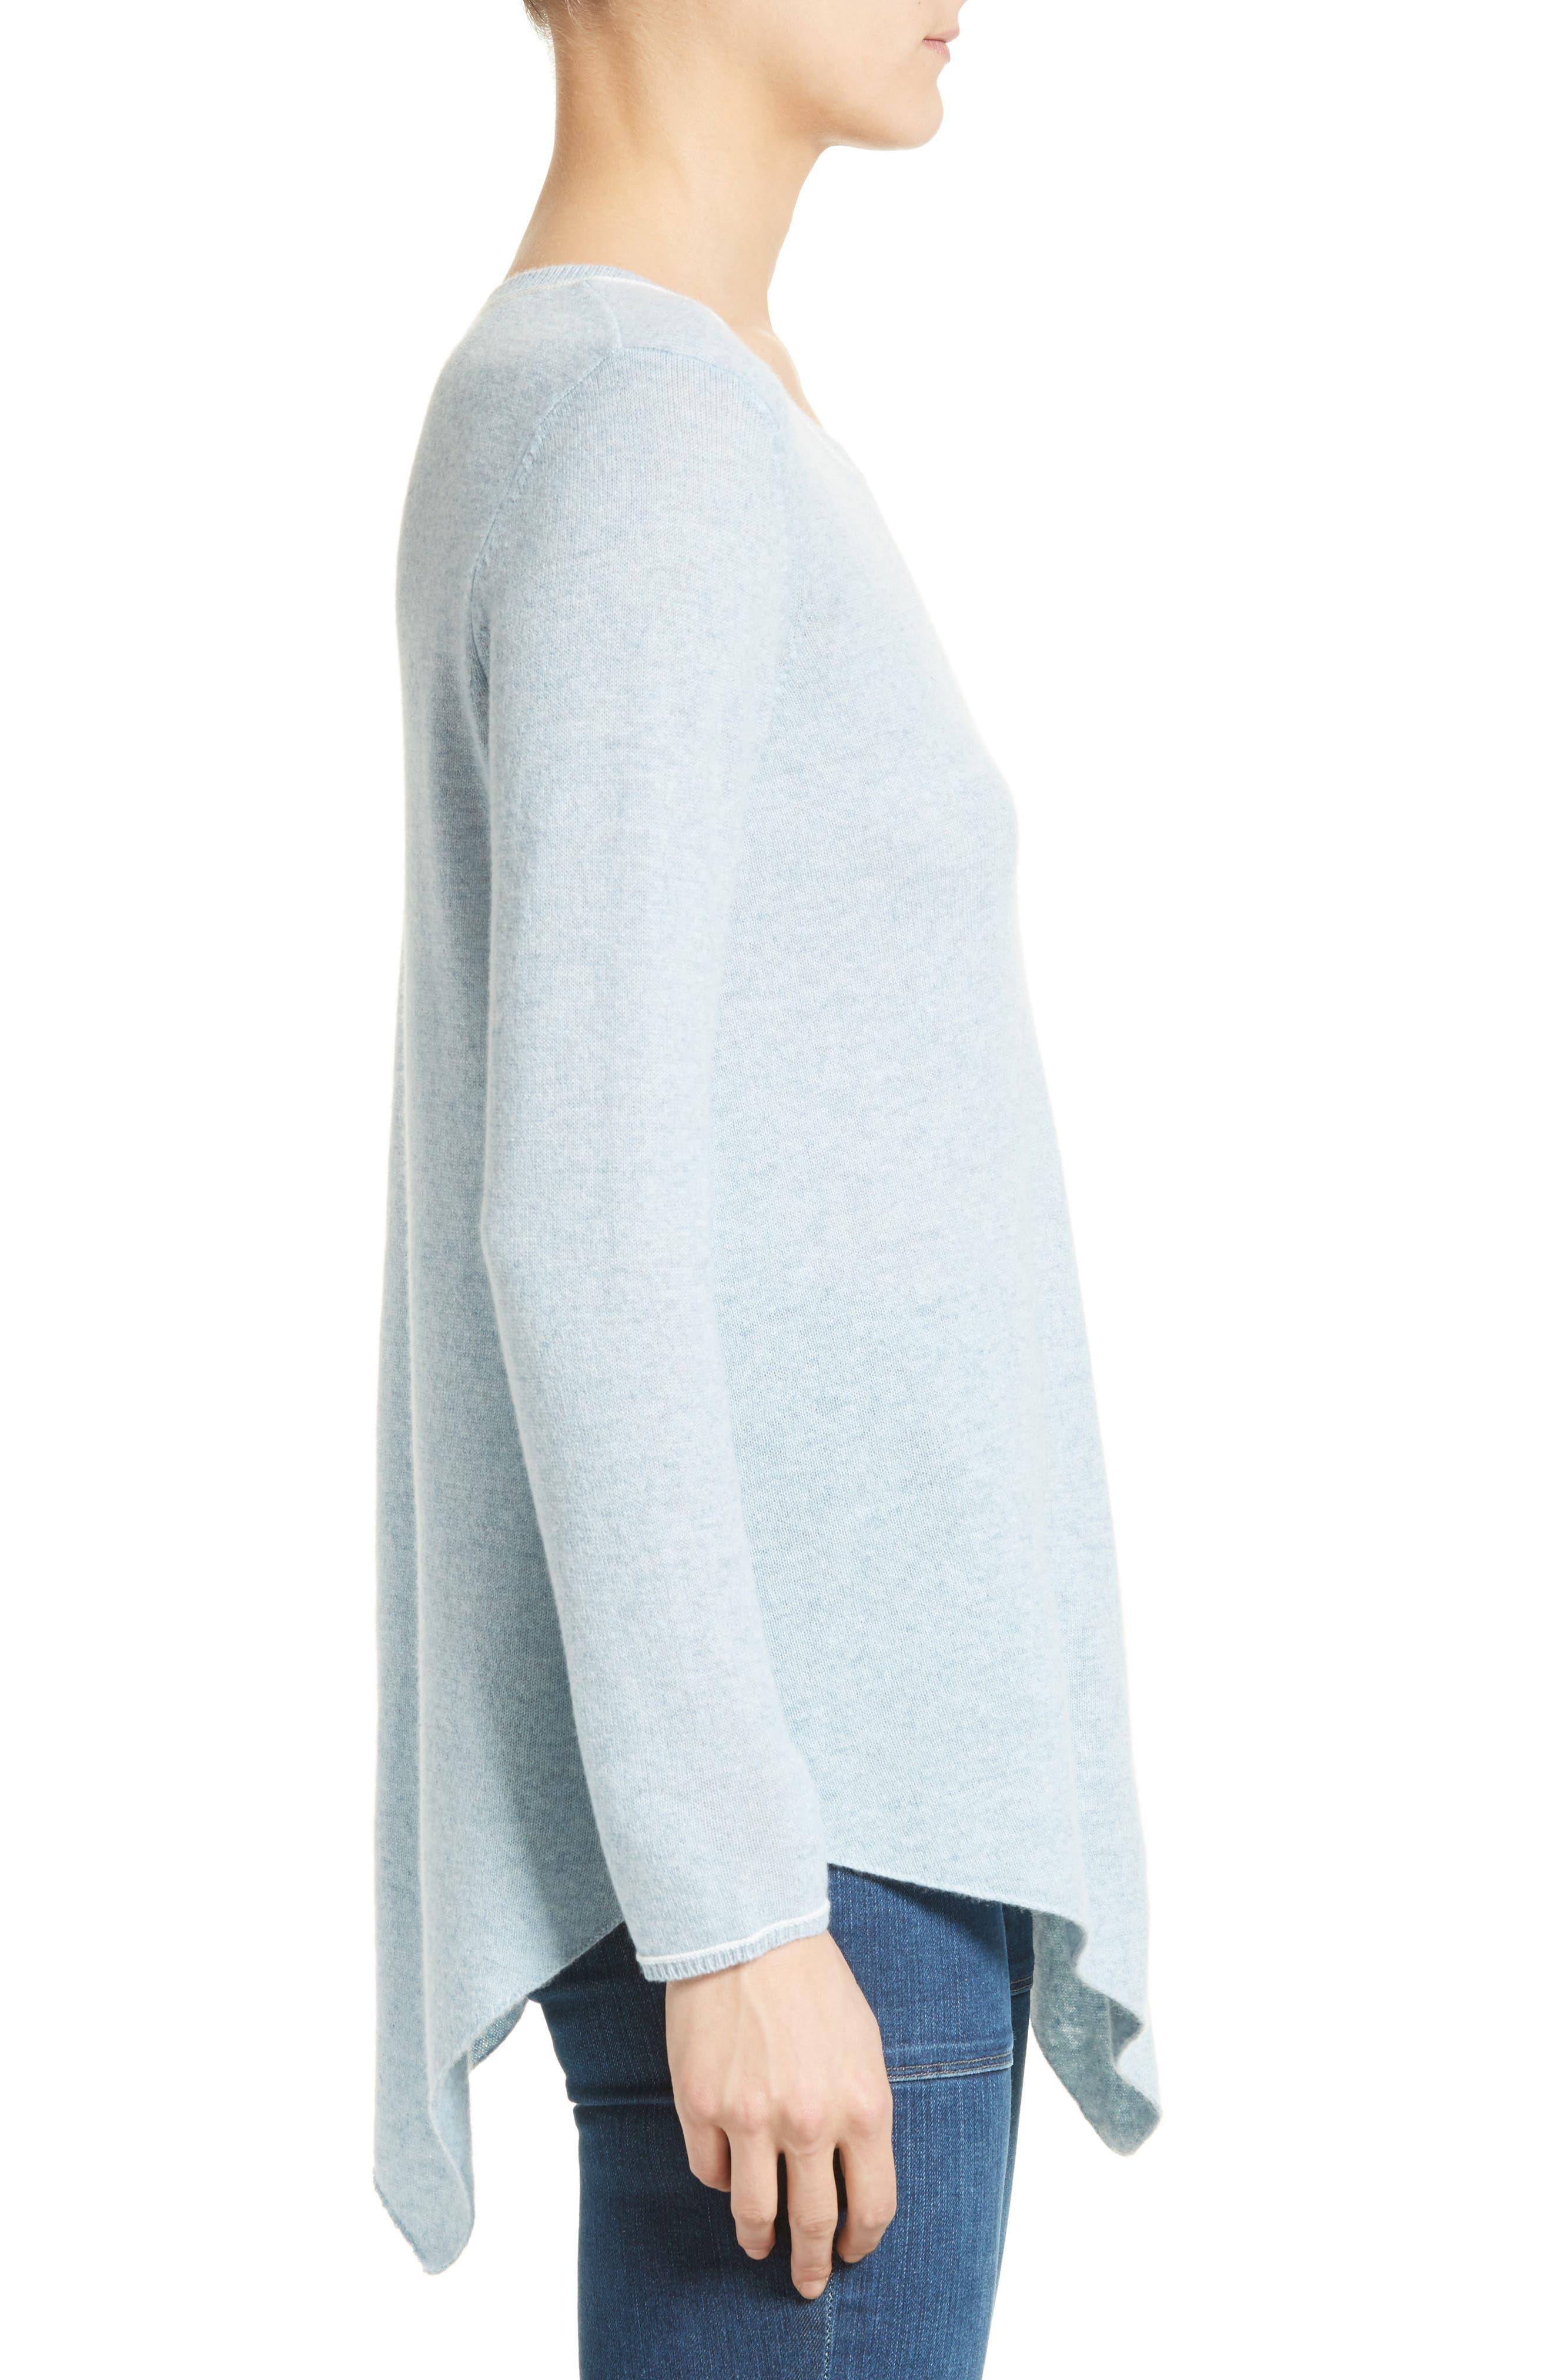 Tambrel H Asymmetrical Hem Cashmere Sweater,                             Alternate thumbnail 3, color,                             400